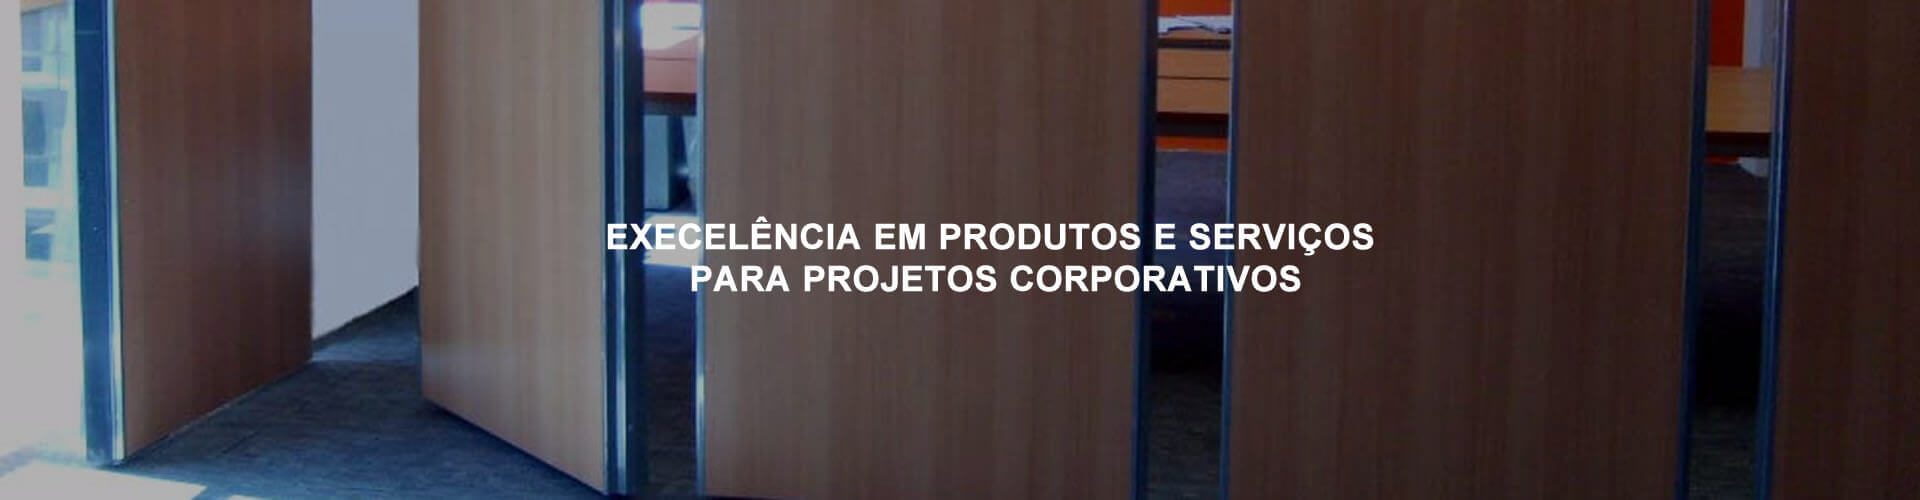 Móveis para Ambientes Corporativos